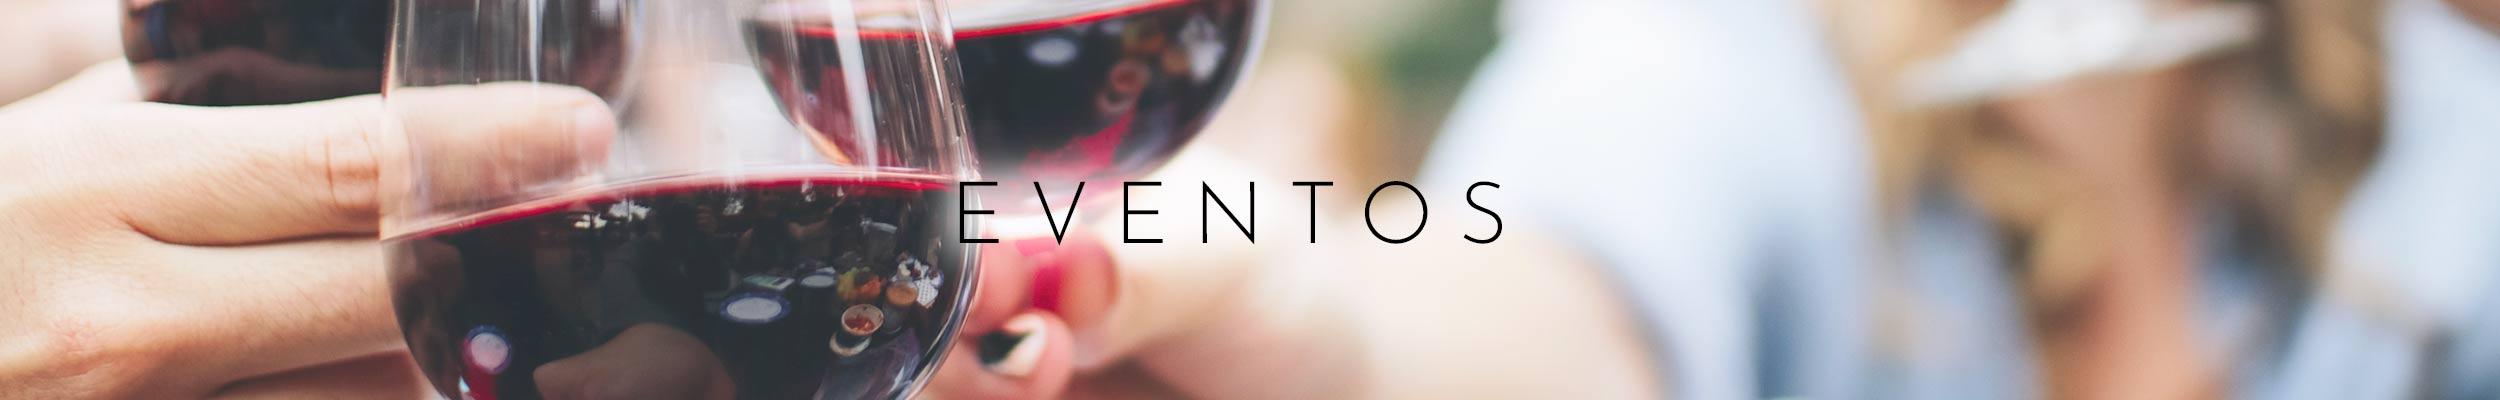 eventos-privados-y-de-empresa-restaurante-chamartin